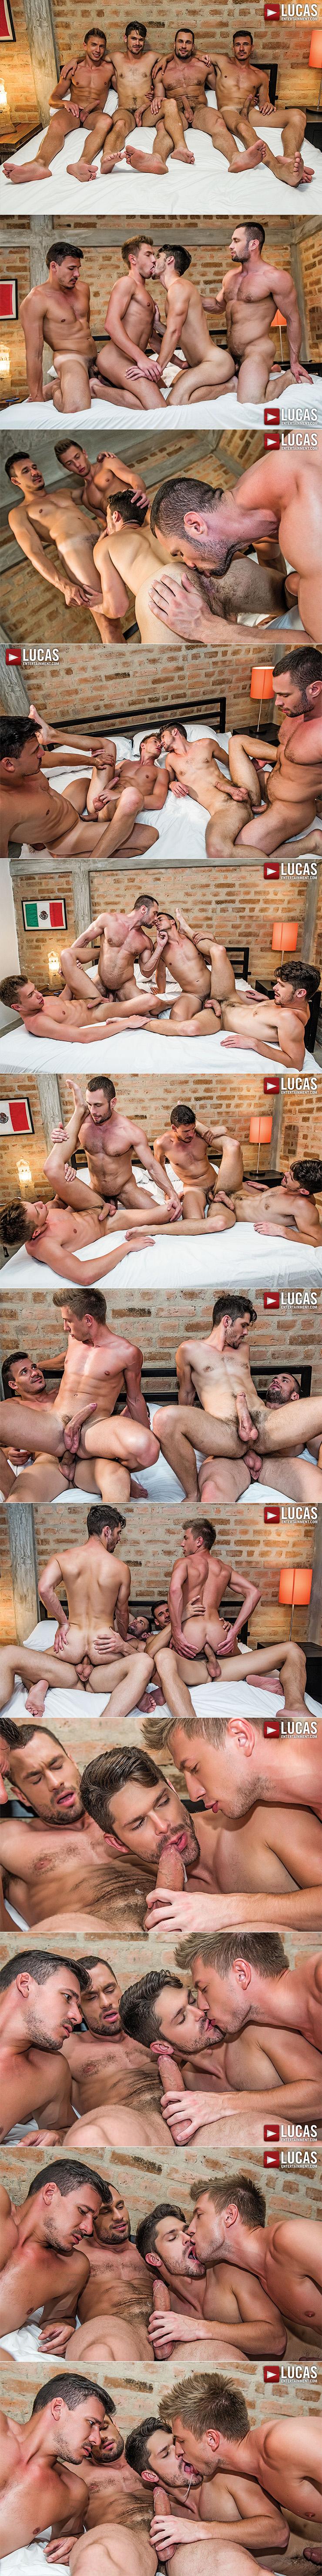 Lucas Entertainment Greedy Holes Devin Franco Bogdan Gromov Bottom For Stas Landon Roman Berman Male Feet Soles Bareback Sex Uncut Cocks 2